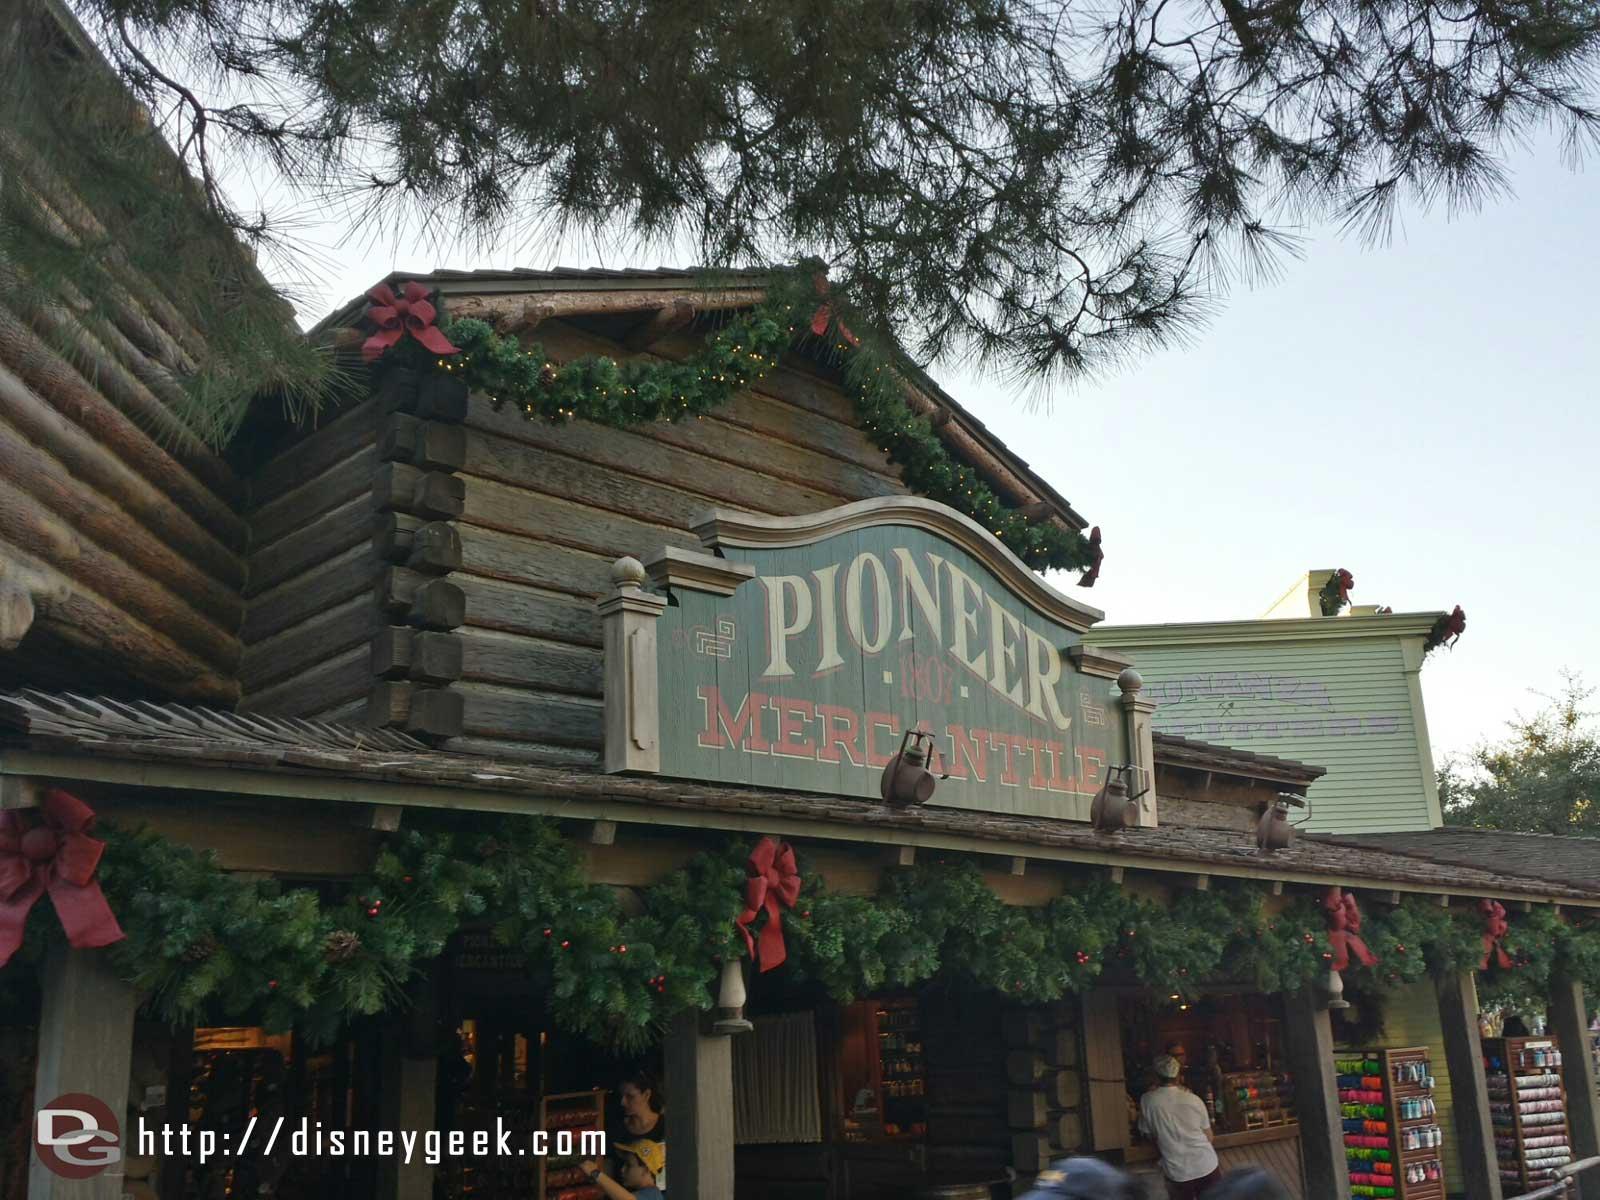 Pioneer Mercantile Christmas decorations #Disneyland